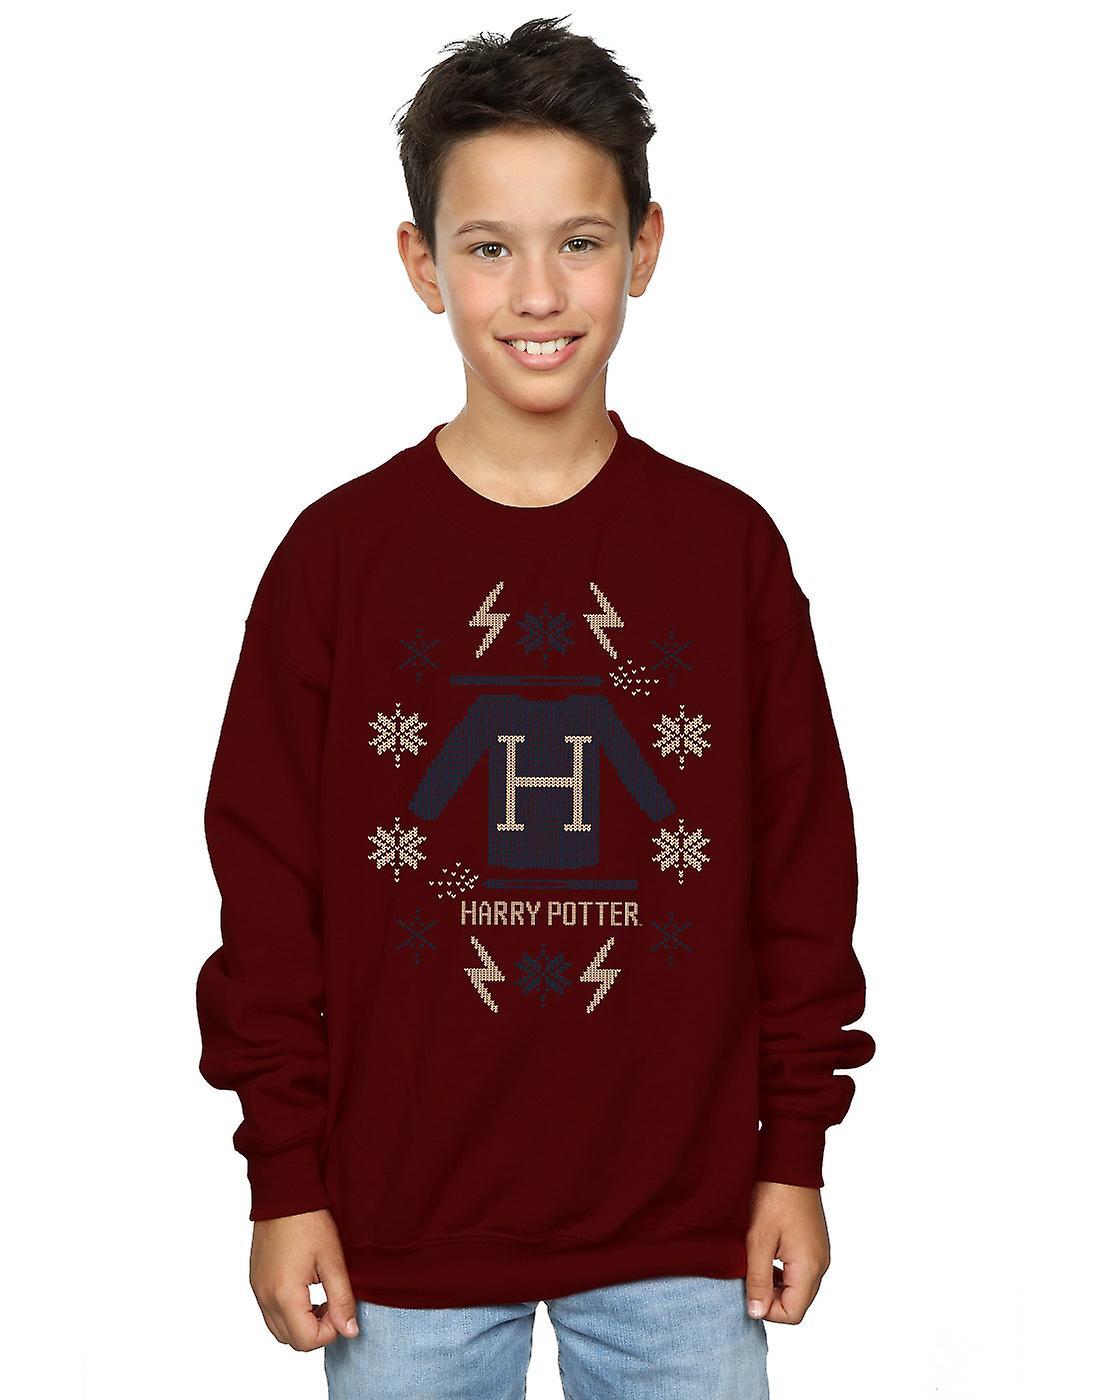 Harry Potter Boys Christmas Knit Sweatshirt